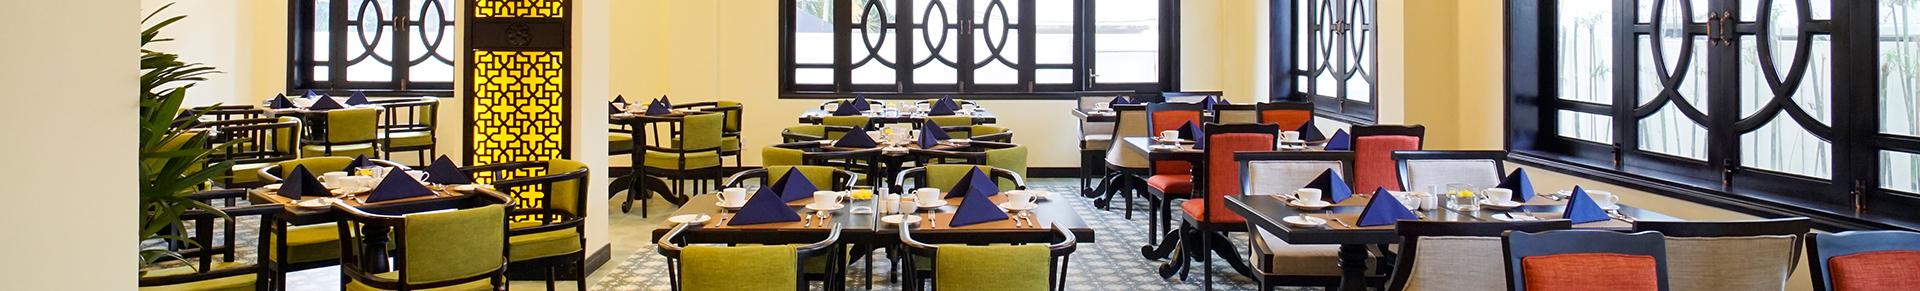 Le Pavillon Resort & Spa Dining